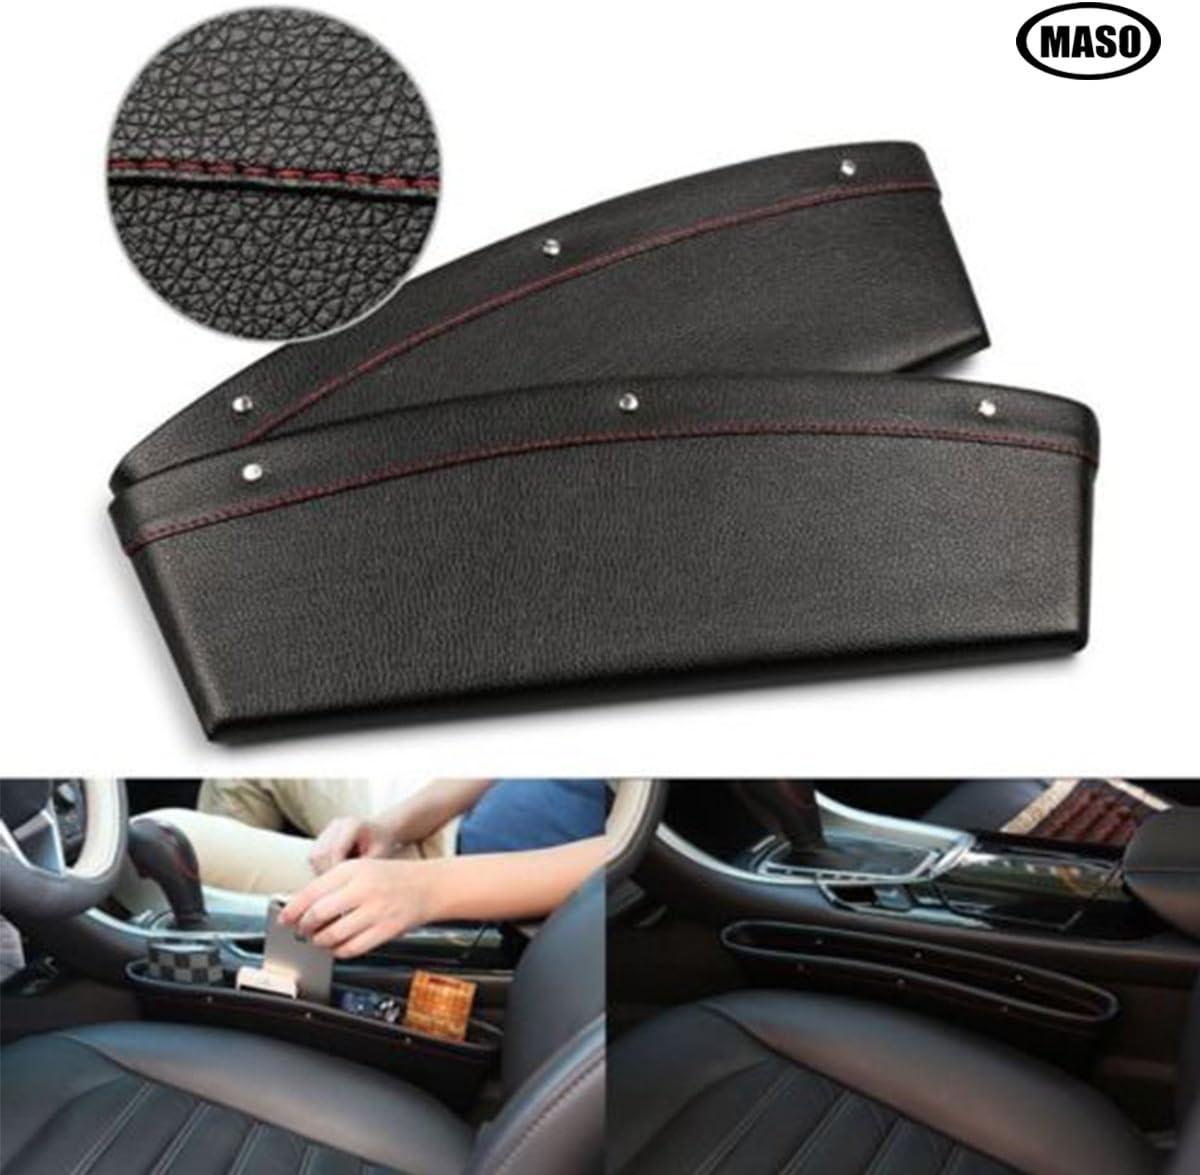 Car Gap Seat Pocket Organizer /& Filler for Car Seat Crevice Storage Holding Phone Sunglasses Keys Cards Pens Coins pengxiaomei 2Pcs Car Pocket Organizer Black